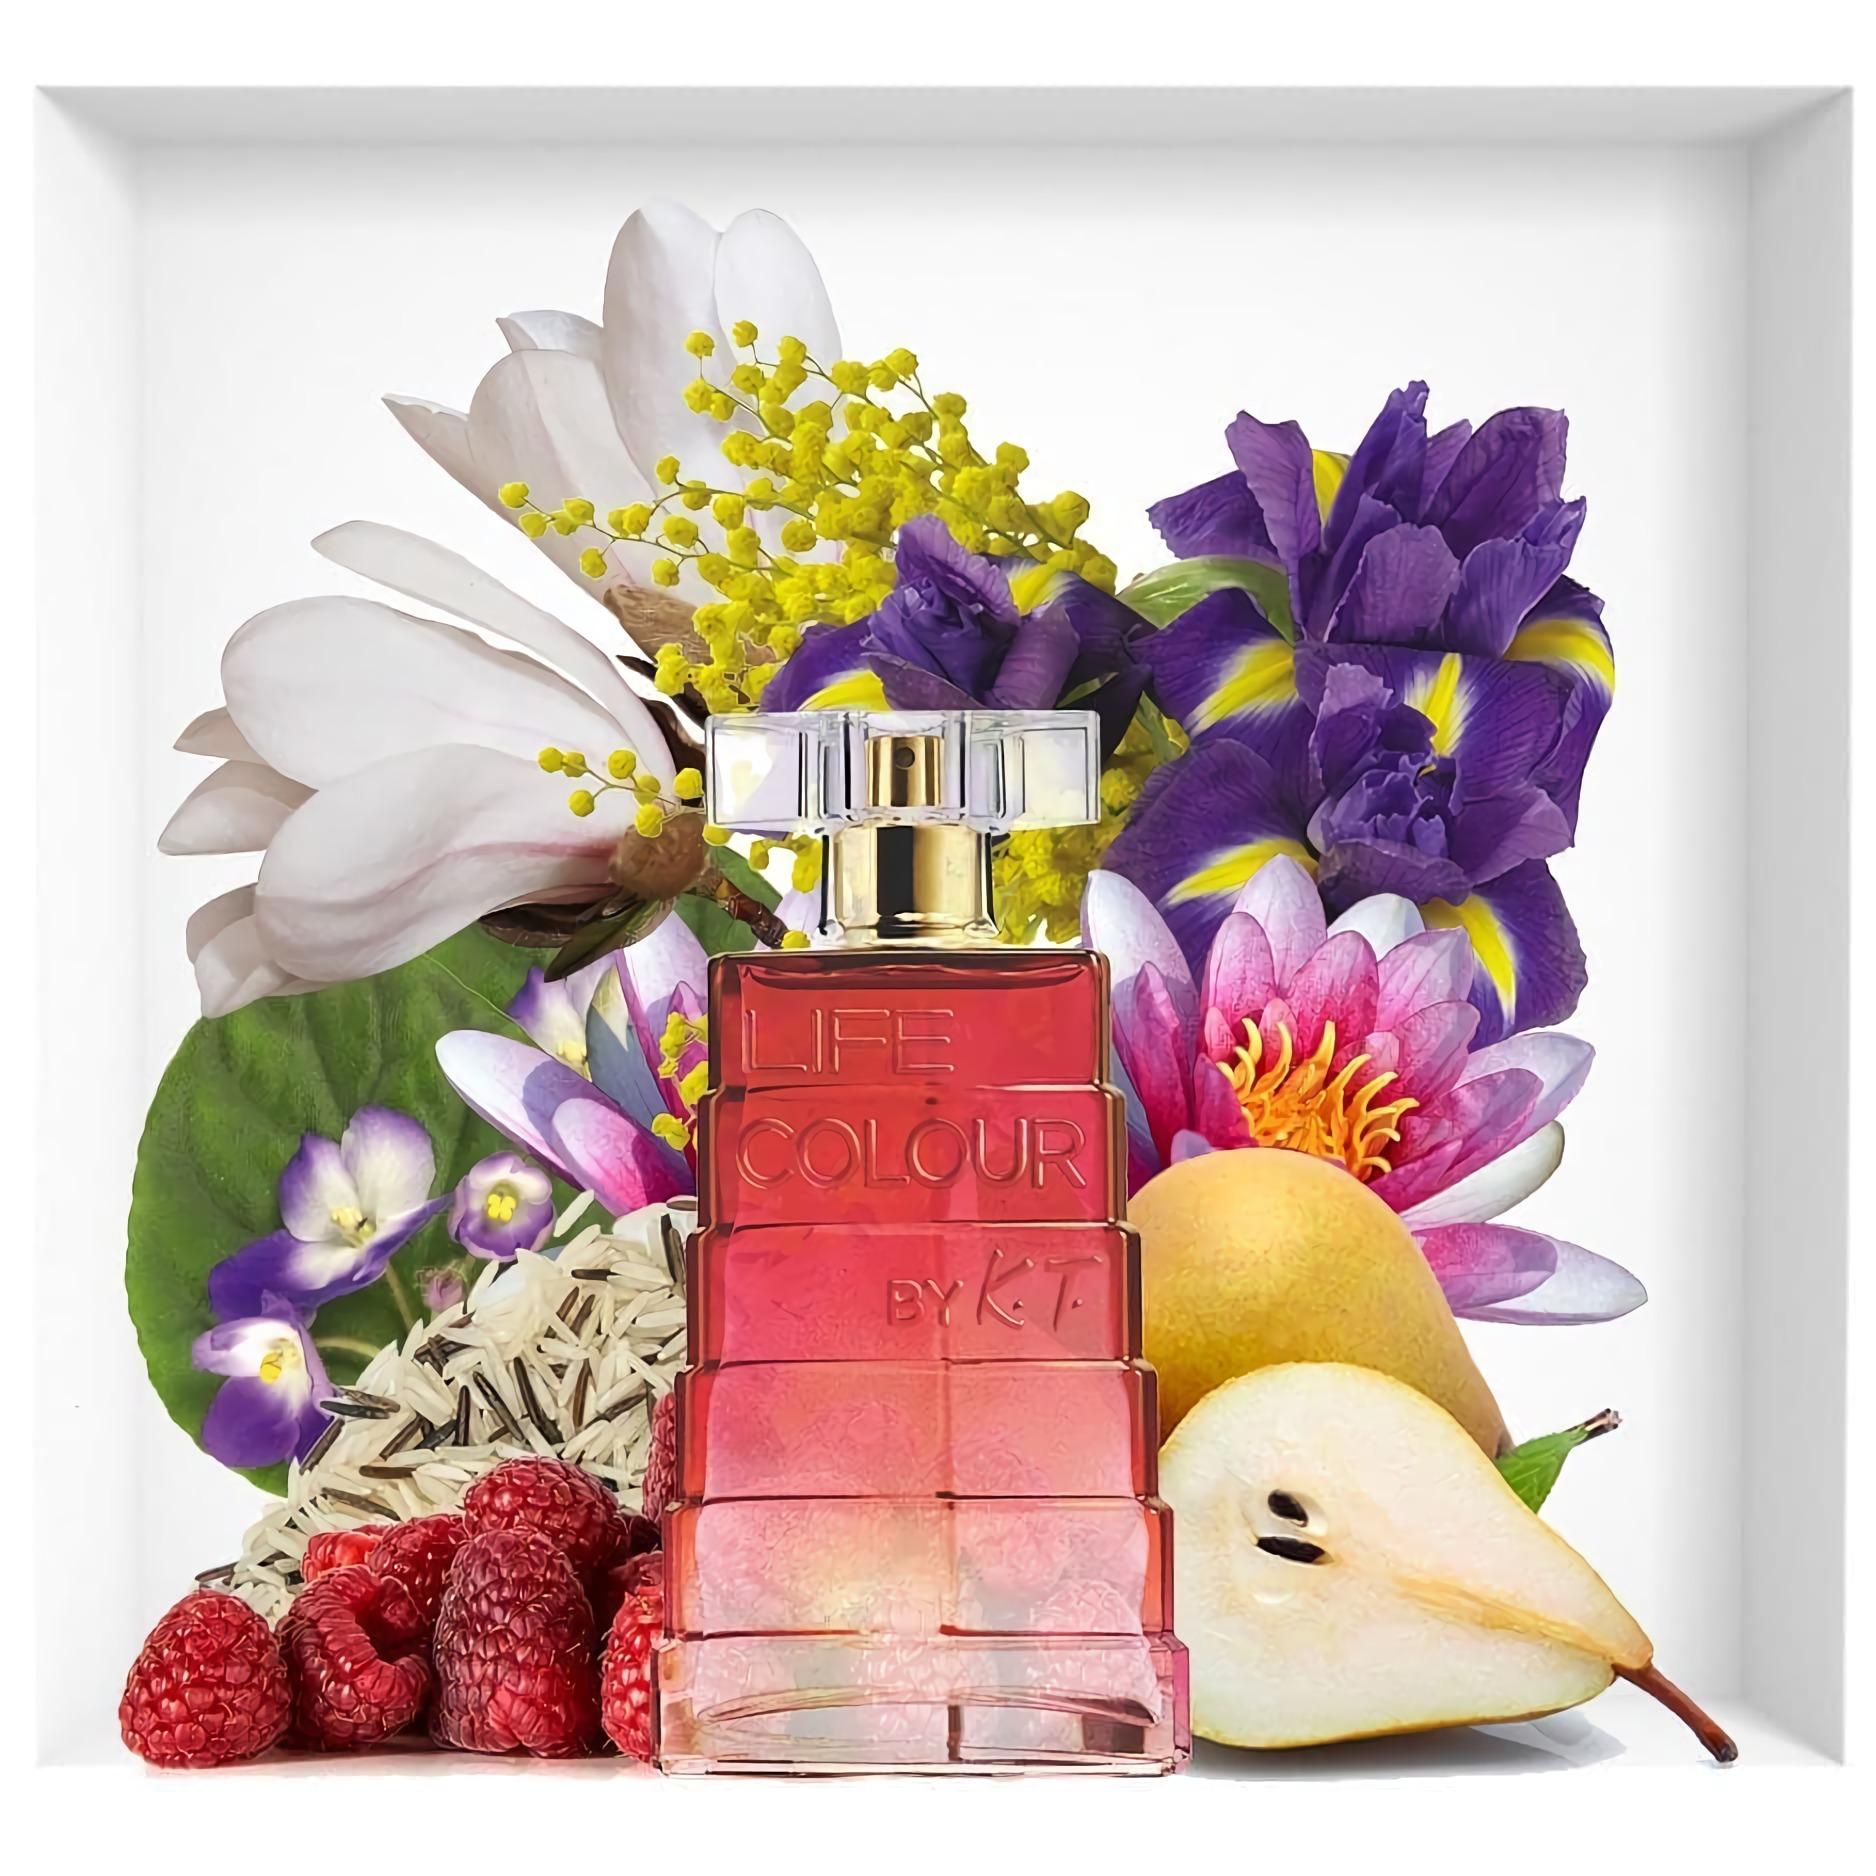 женские духи с игривым запахом Avon Life Colour by K.T